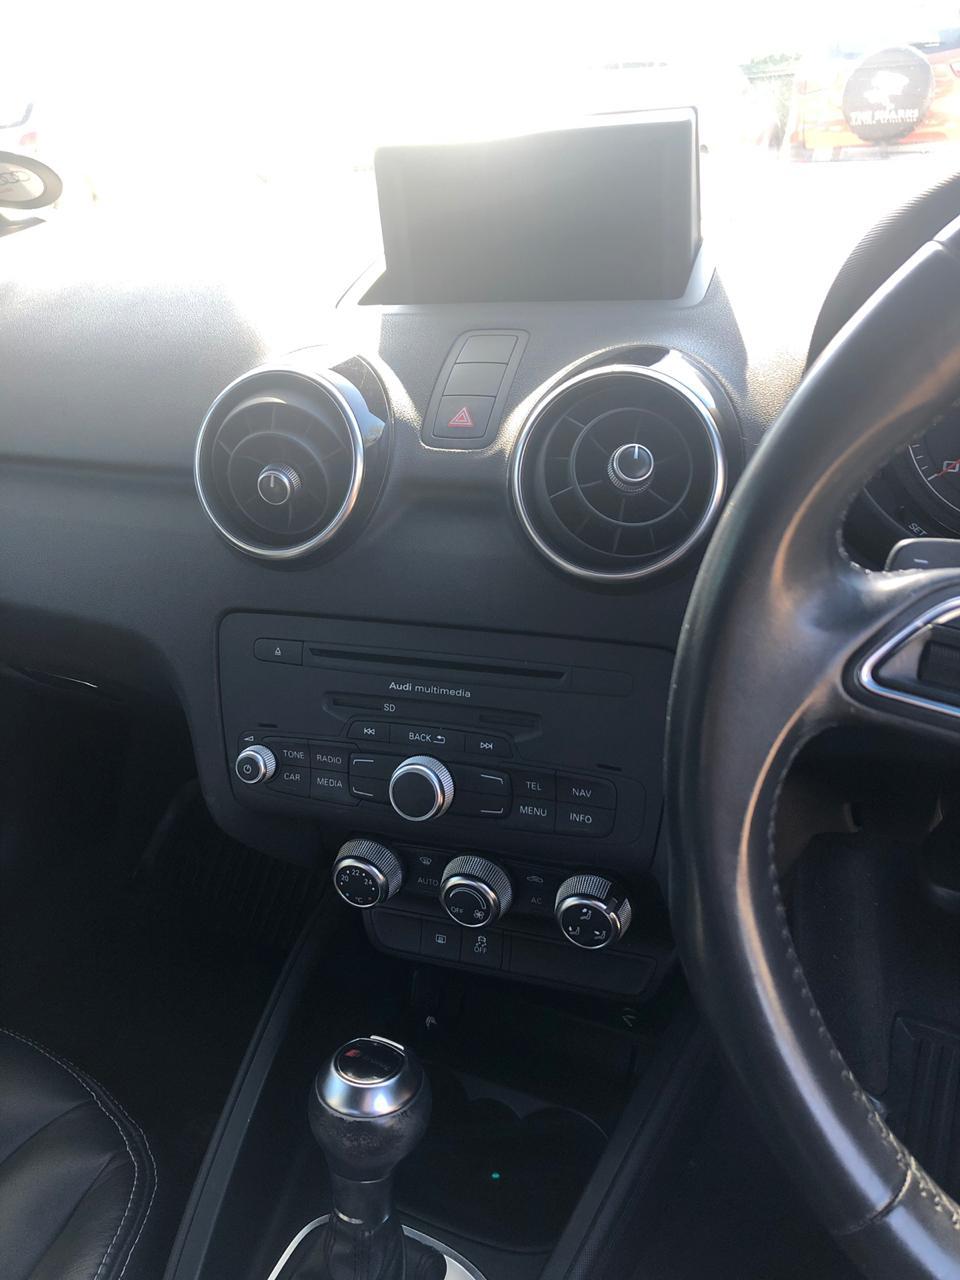 2013 Audi A1 Sportback 1.4TFSI SE auto